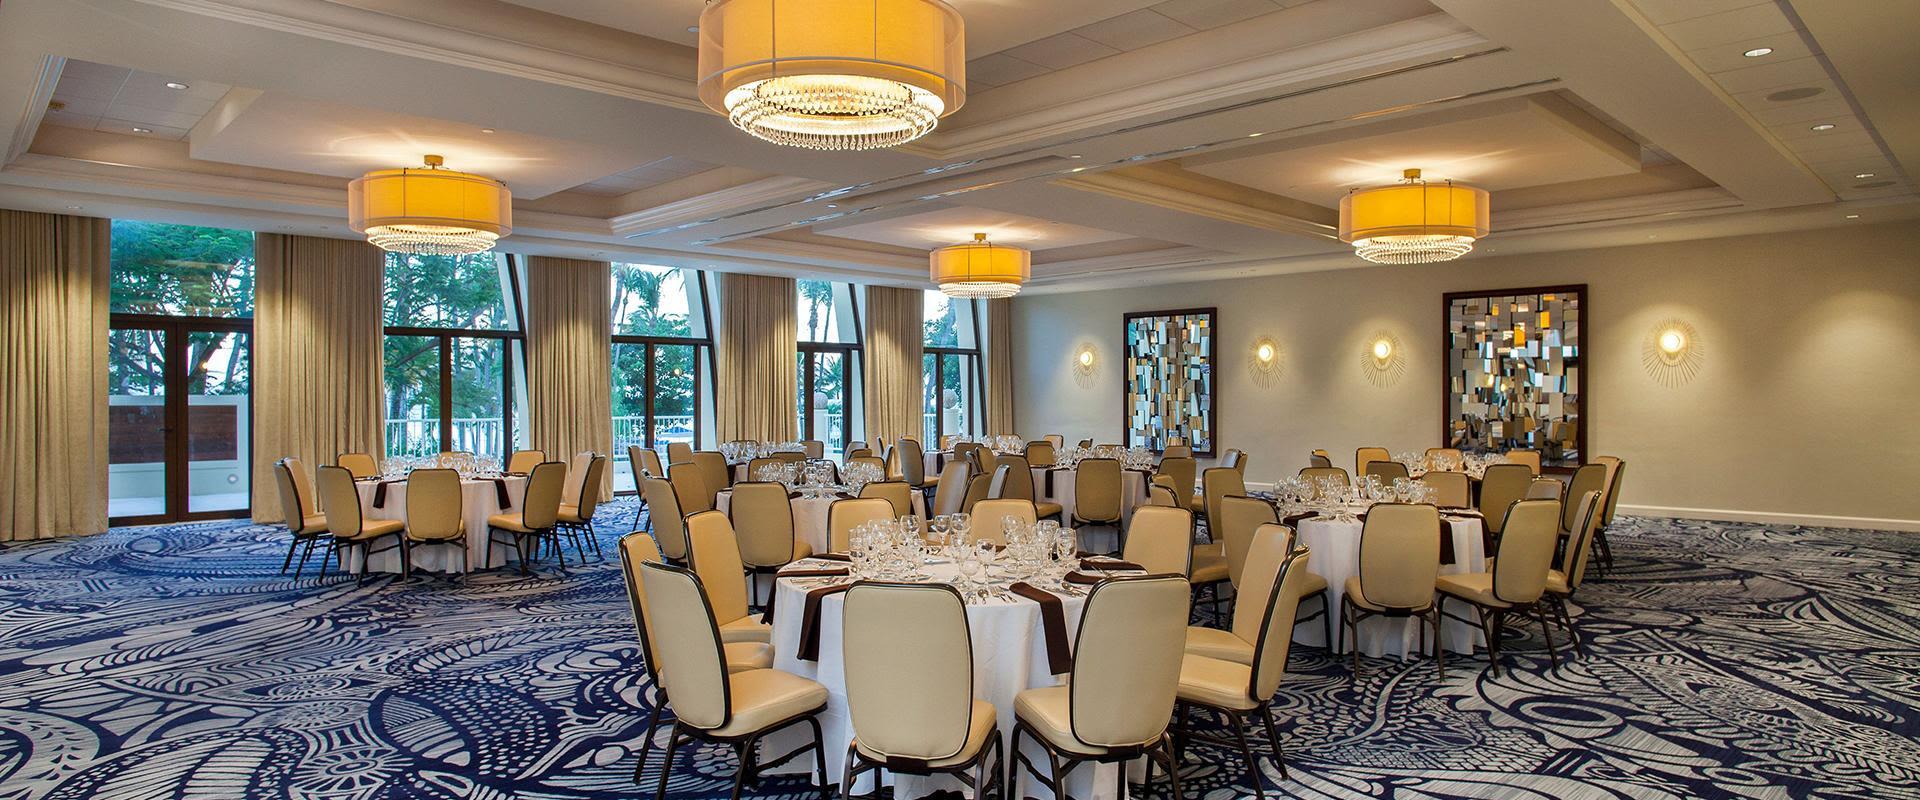 San Juan Resort Banquet Room